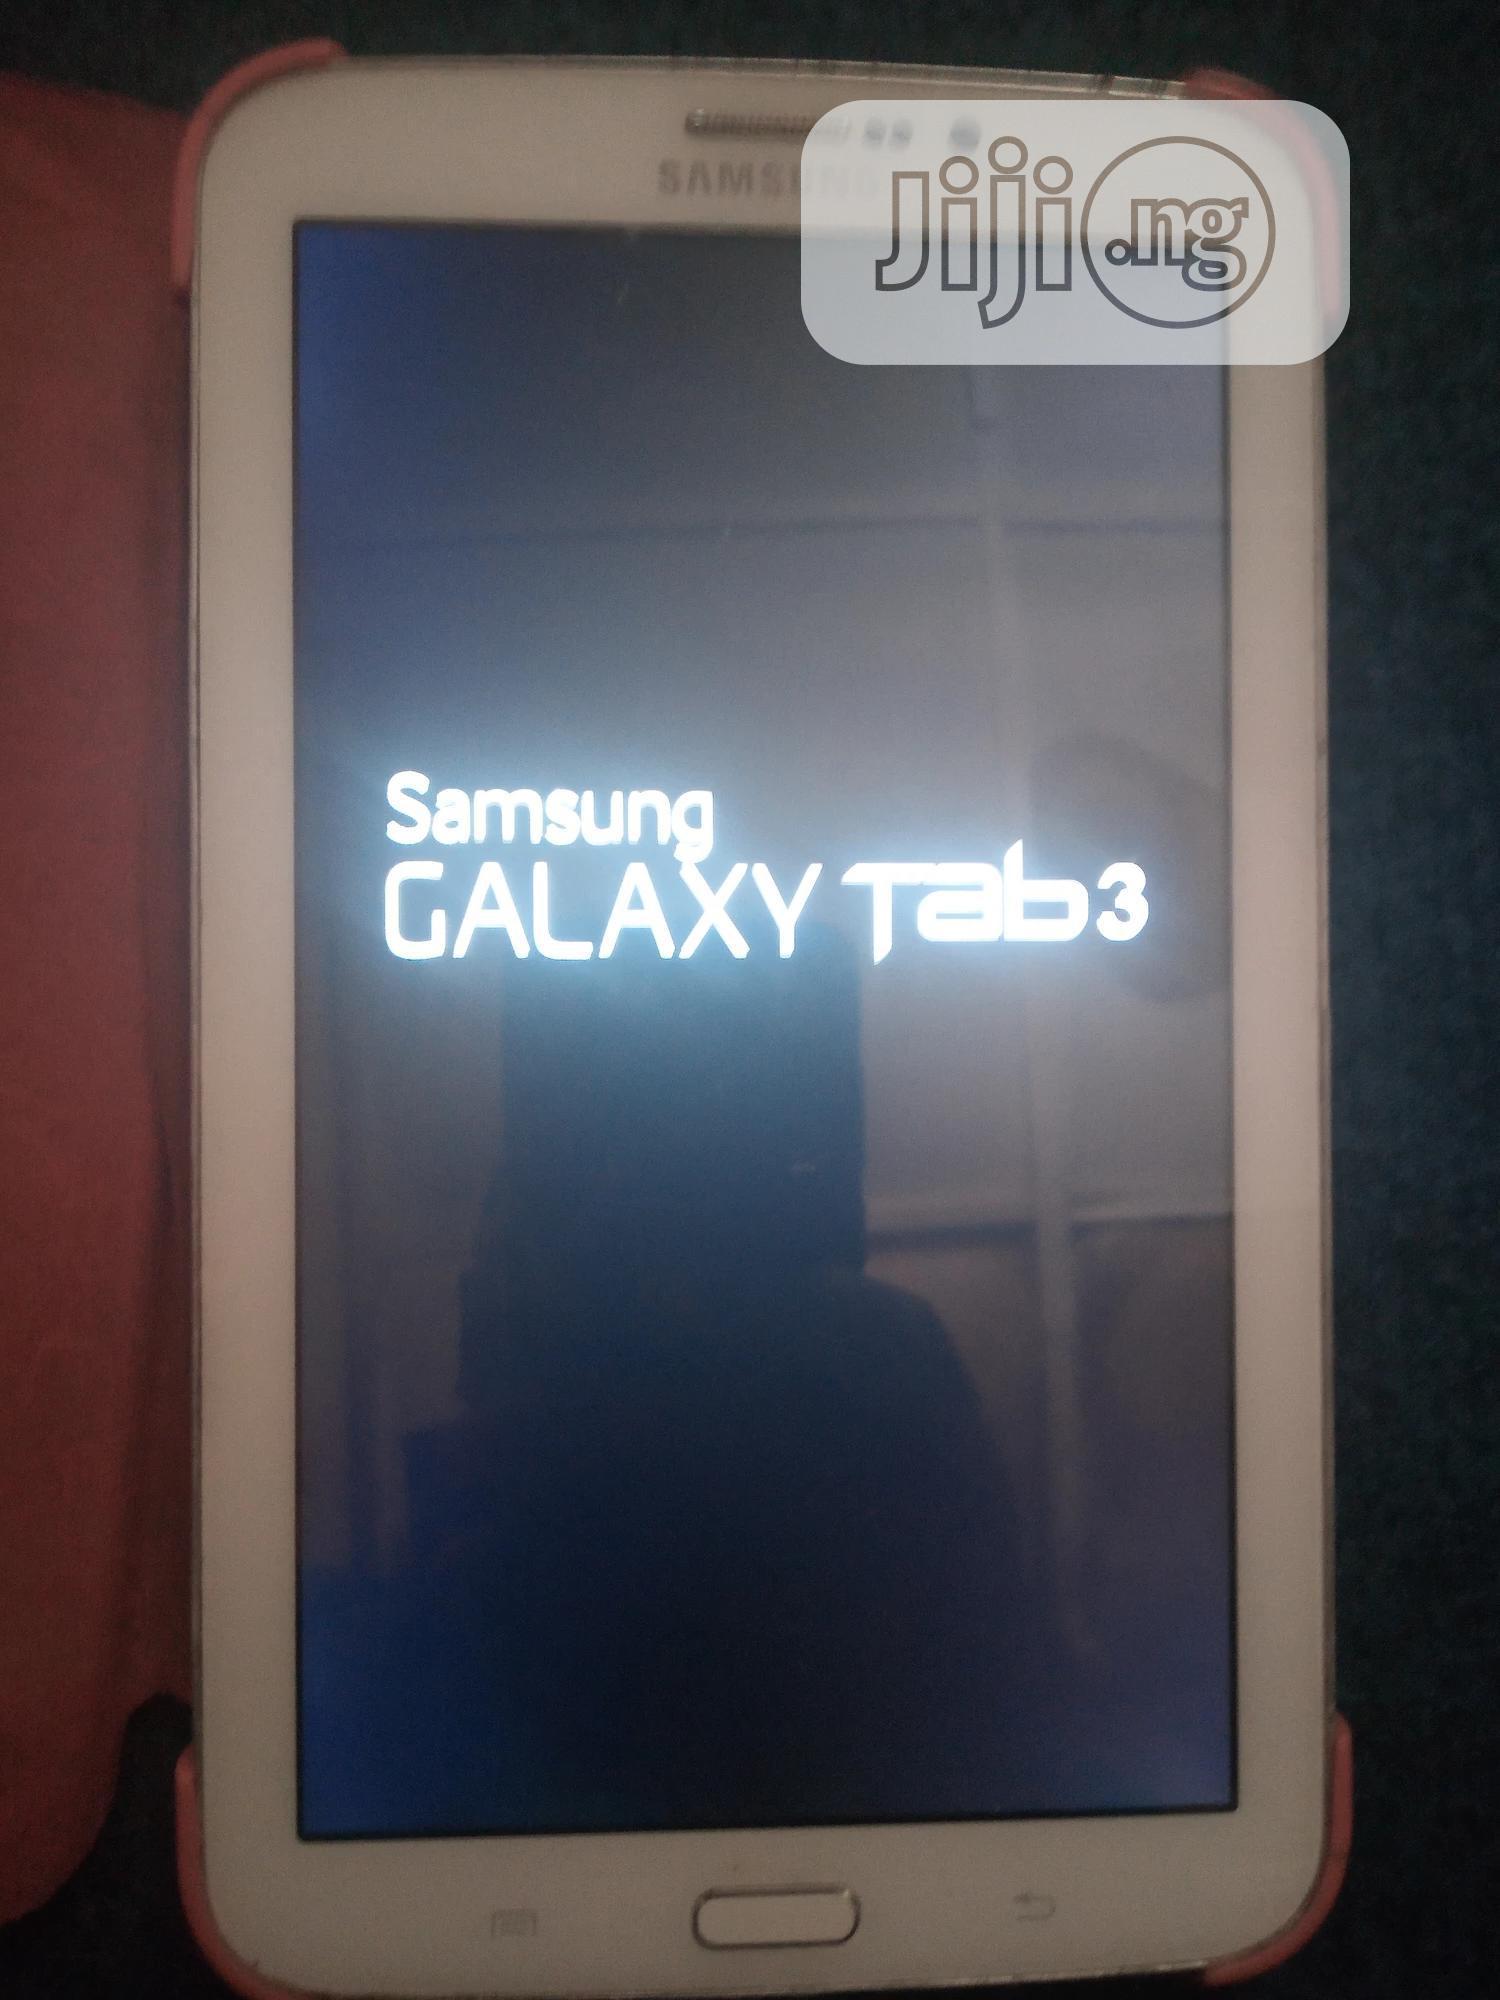 Archive: Samsung Galaxy Tab 3 7.0 8 GB White